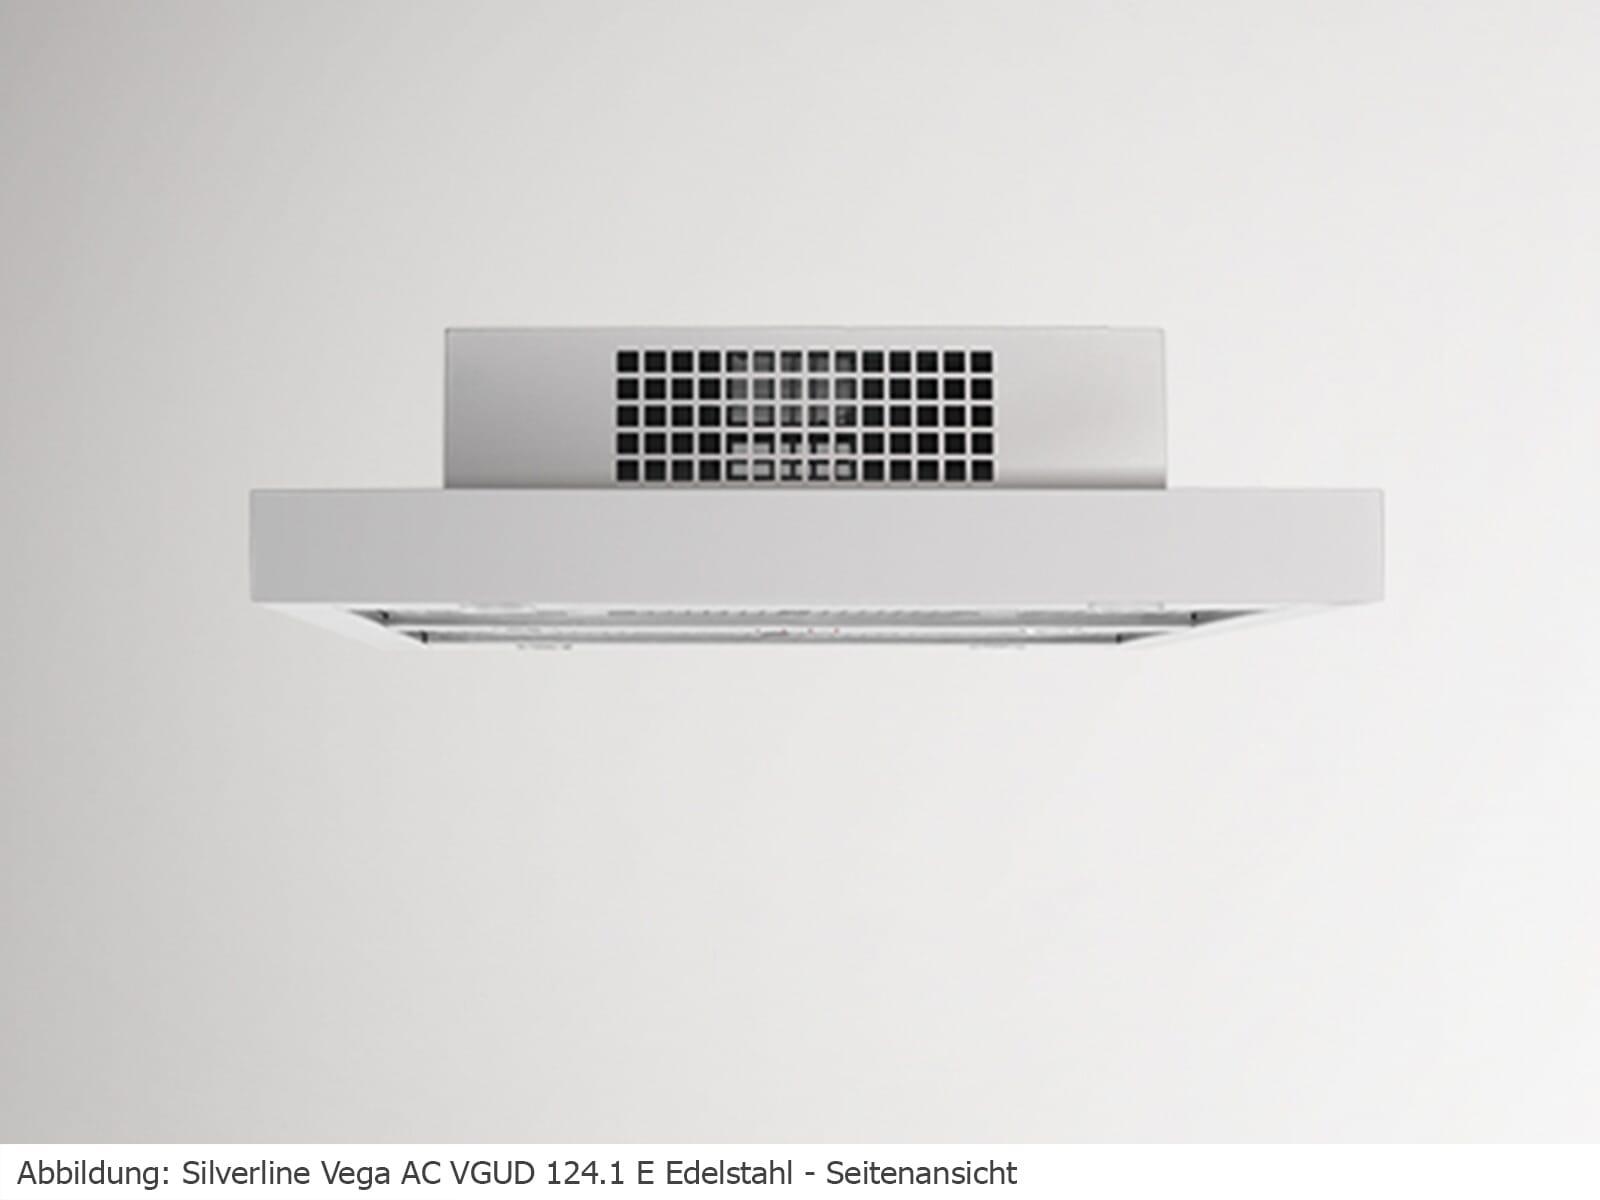 Silverline Vega AC VGUD 124.1 E Deckenhaube Edelstahl